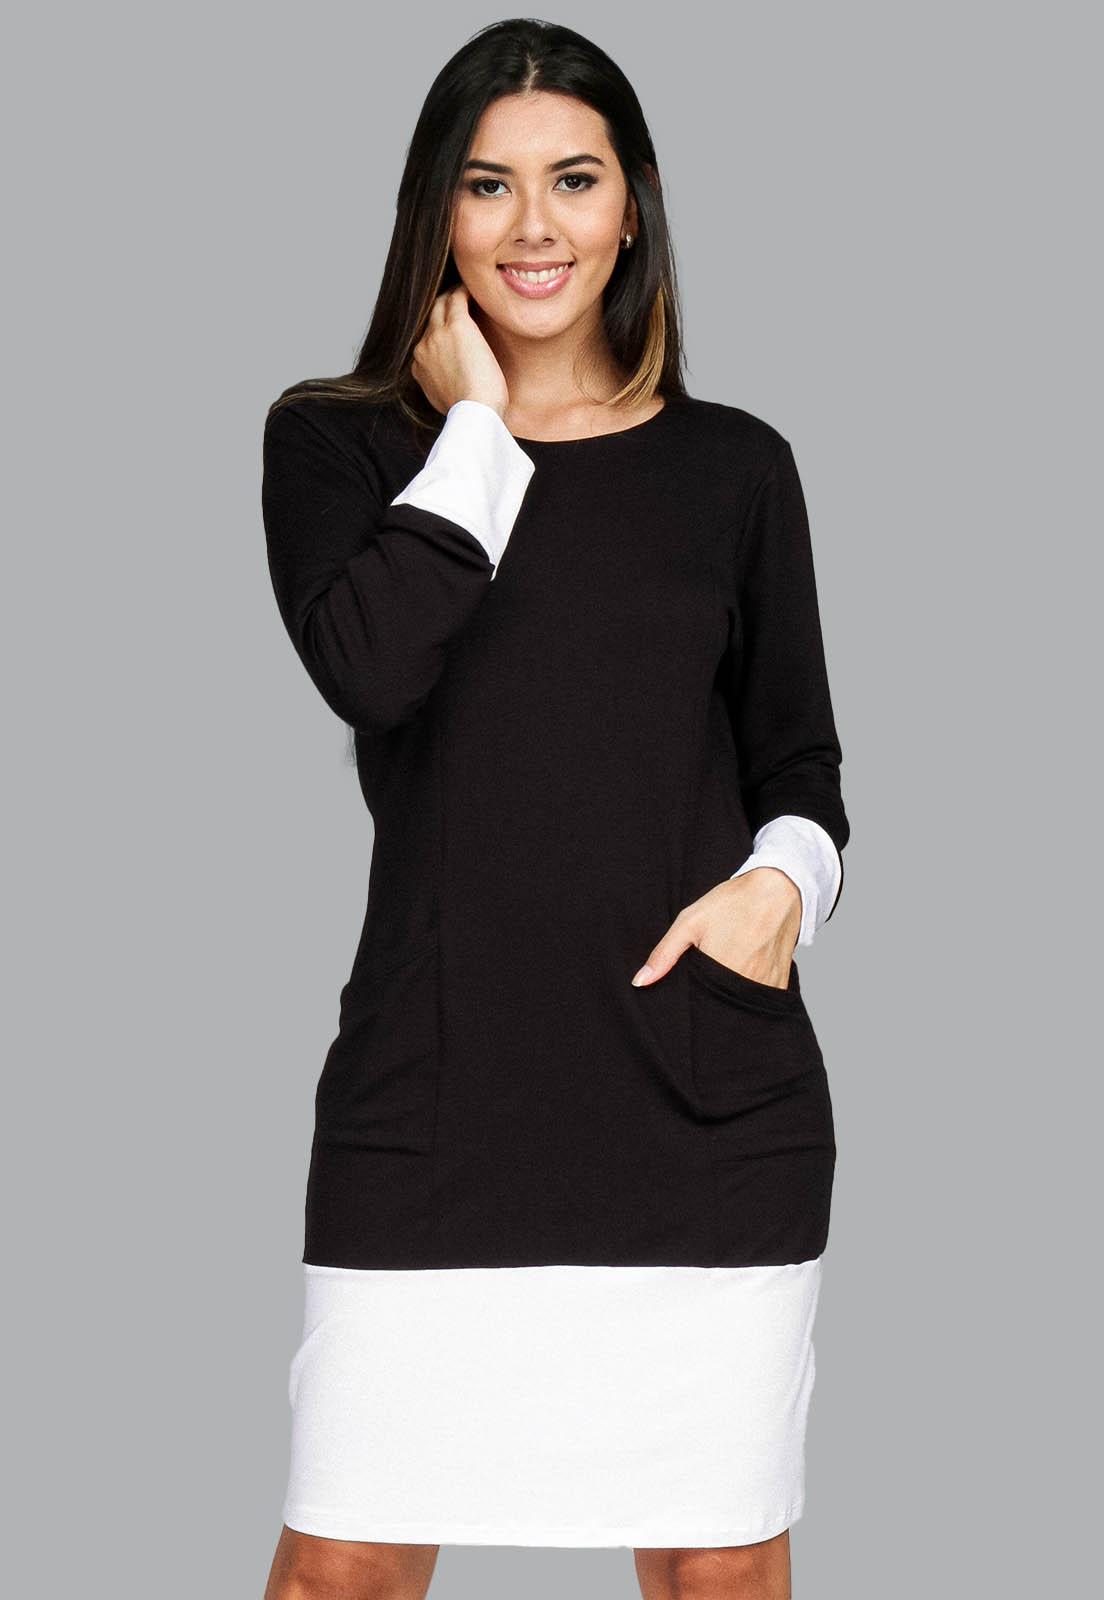 Vestido Curto Malha Manga Longa Preto e Branco